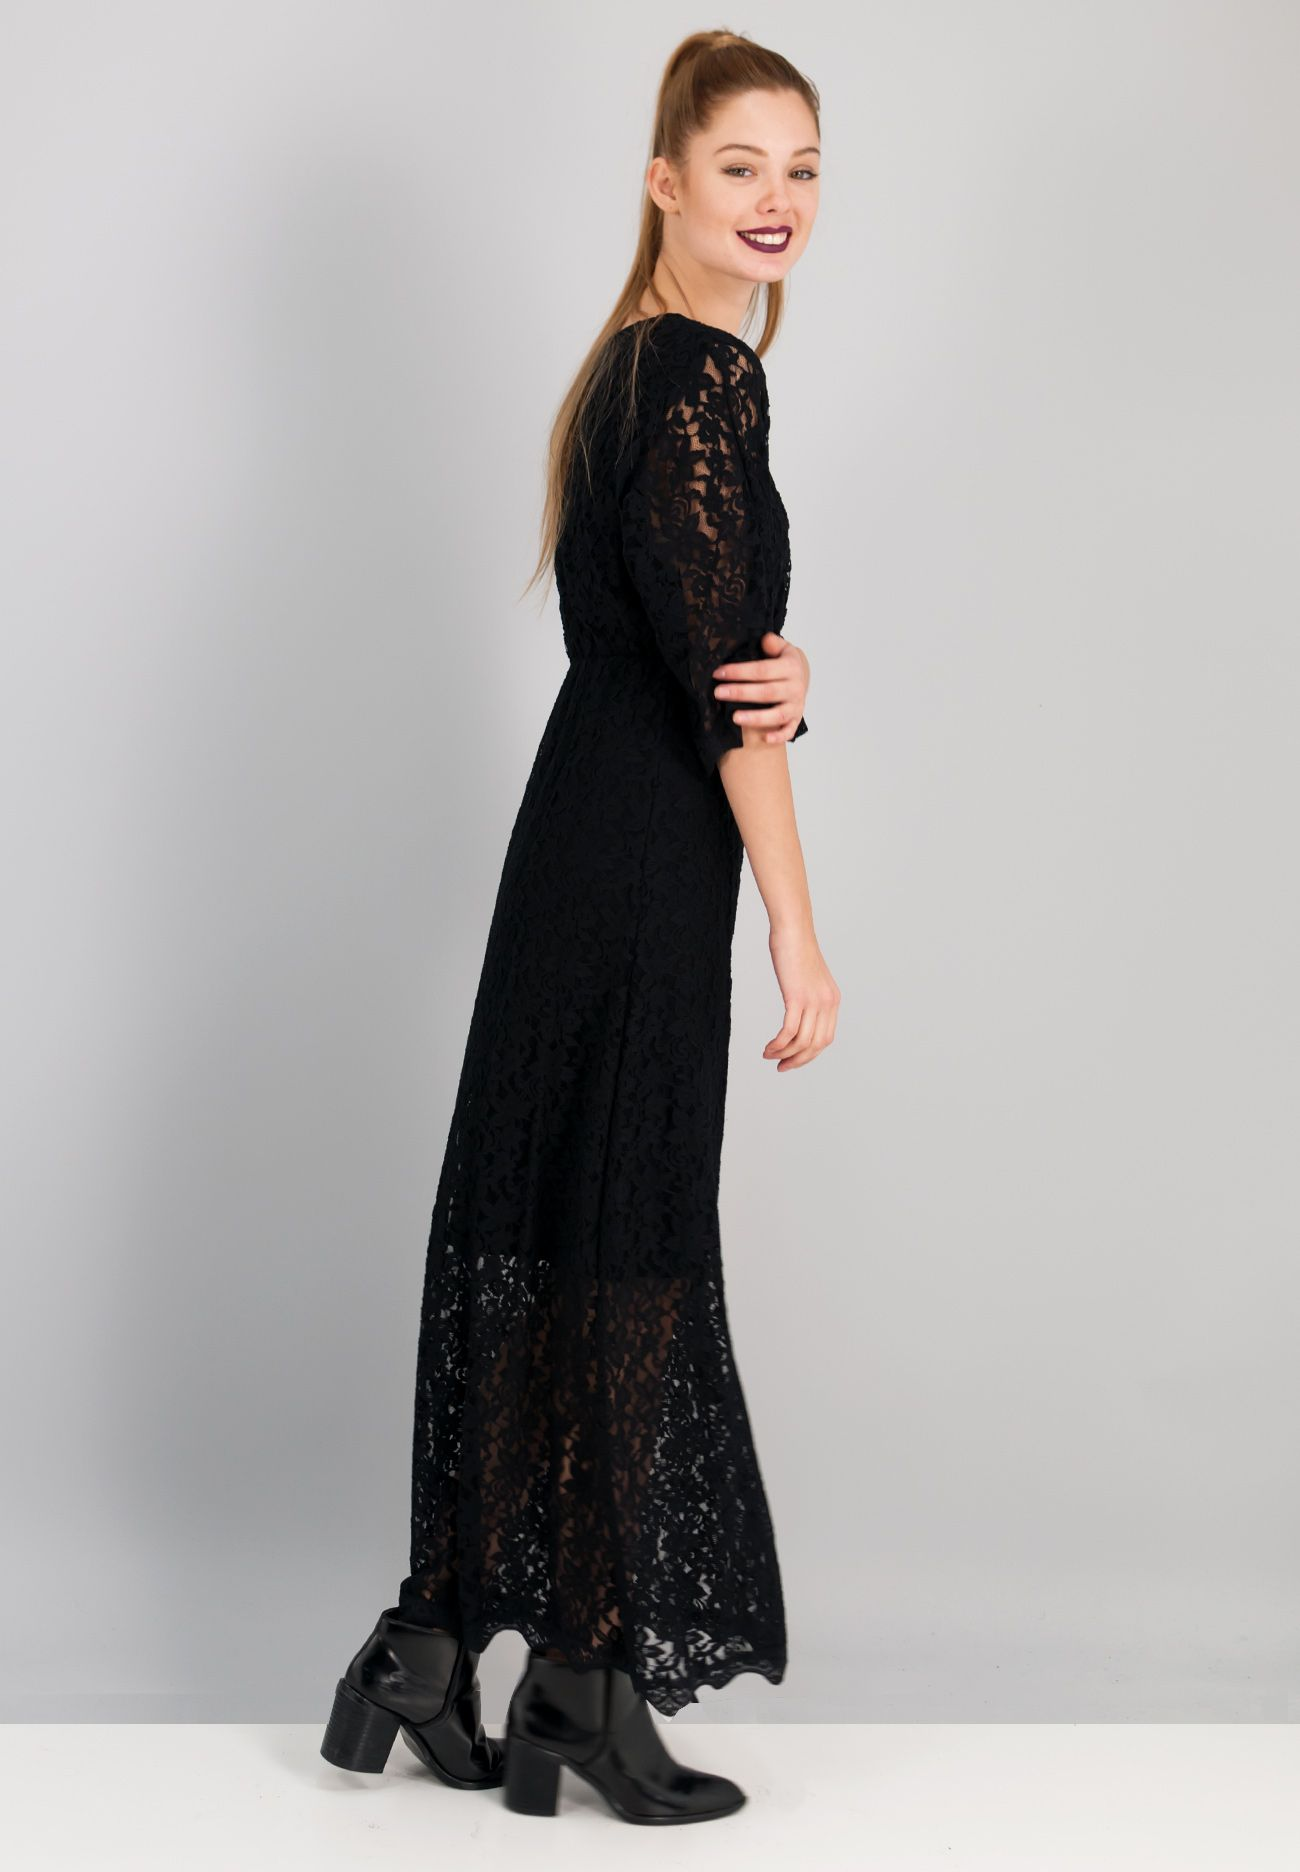 49a97048915d Maxi κρουαζέ δαντελένιο φόρεμα.